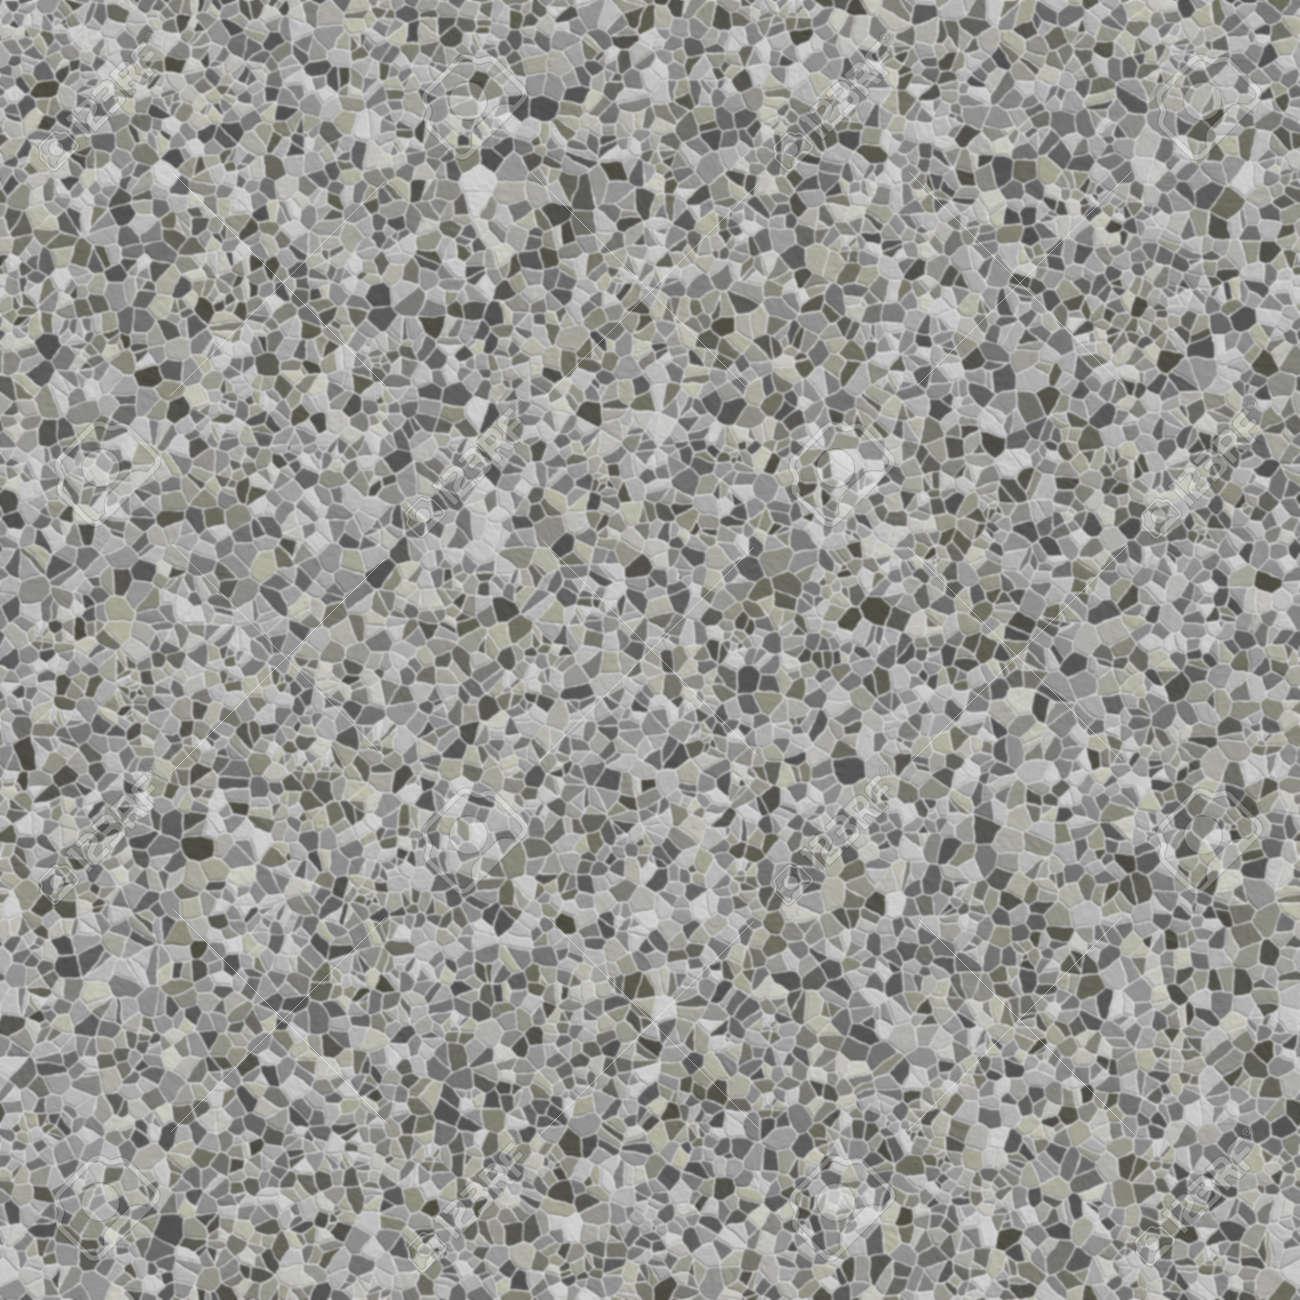 Terrazzo Floor Seamless Texture Tile